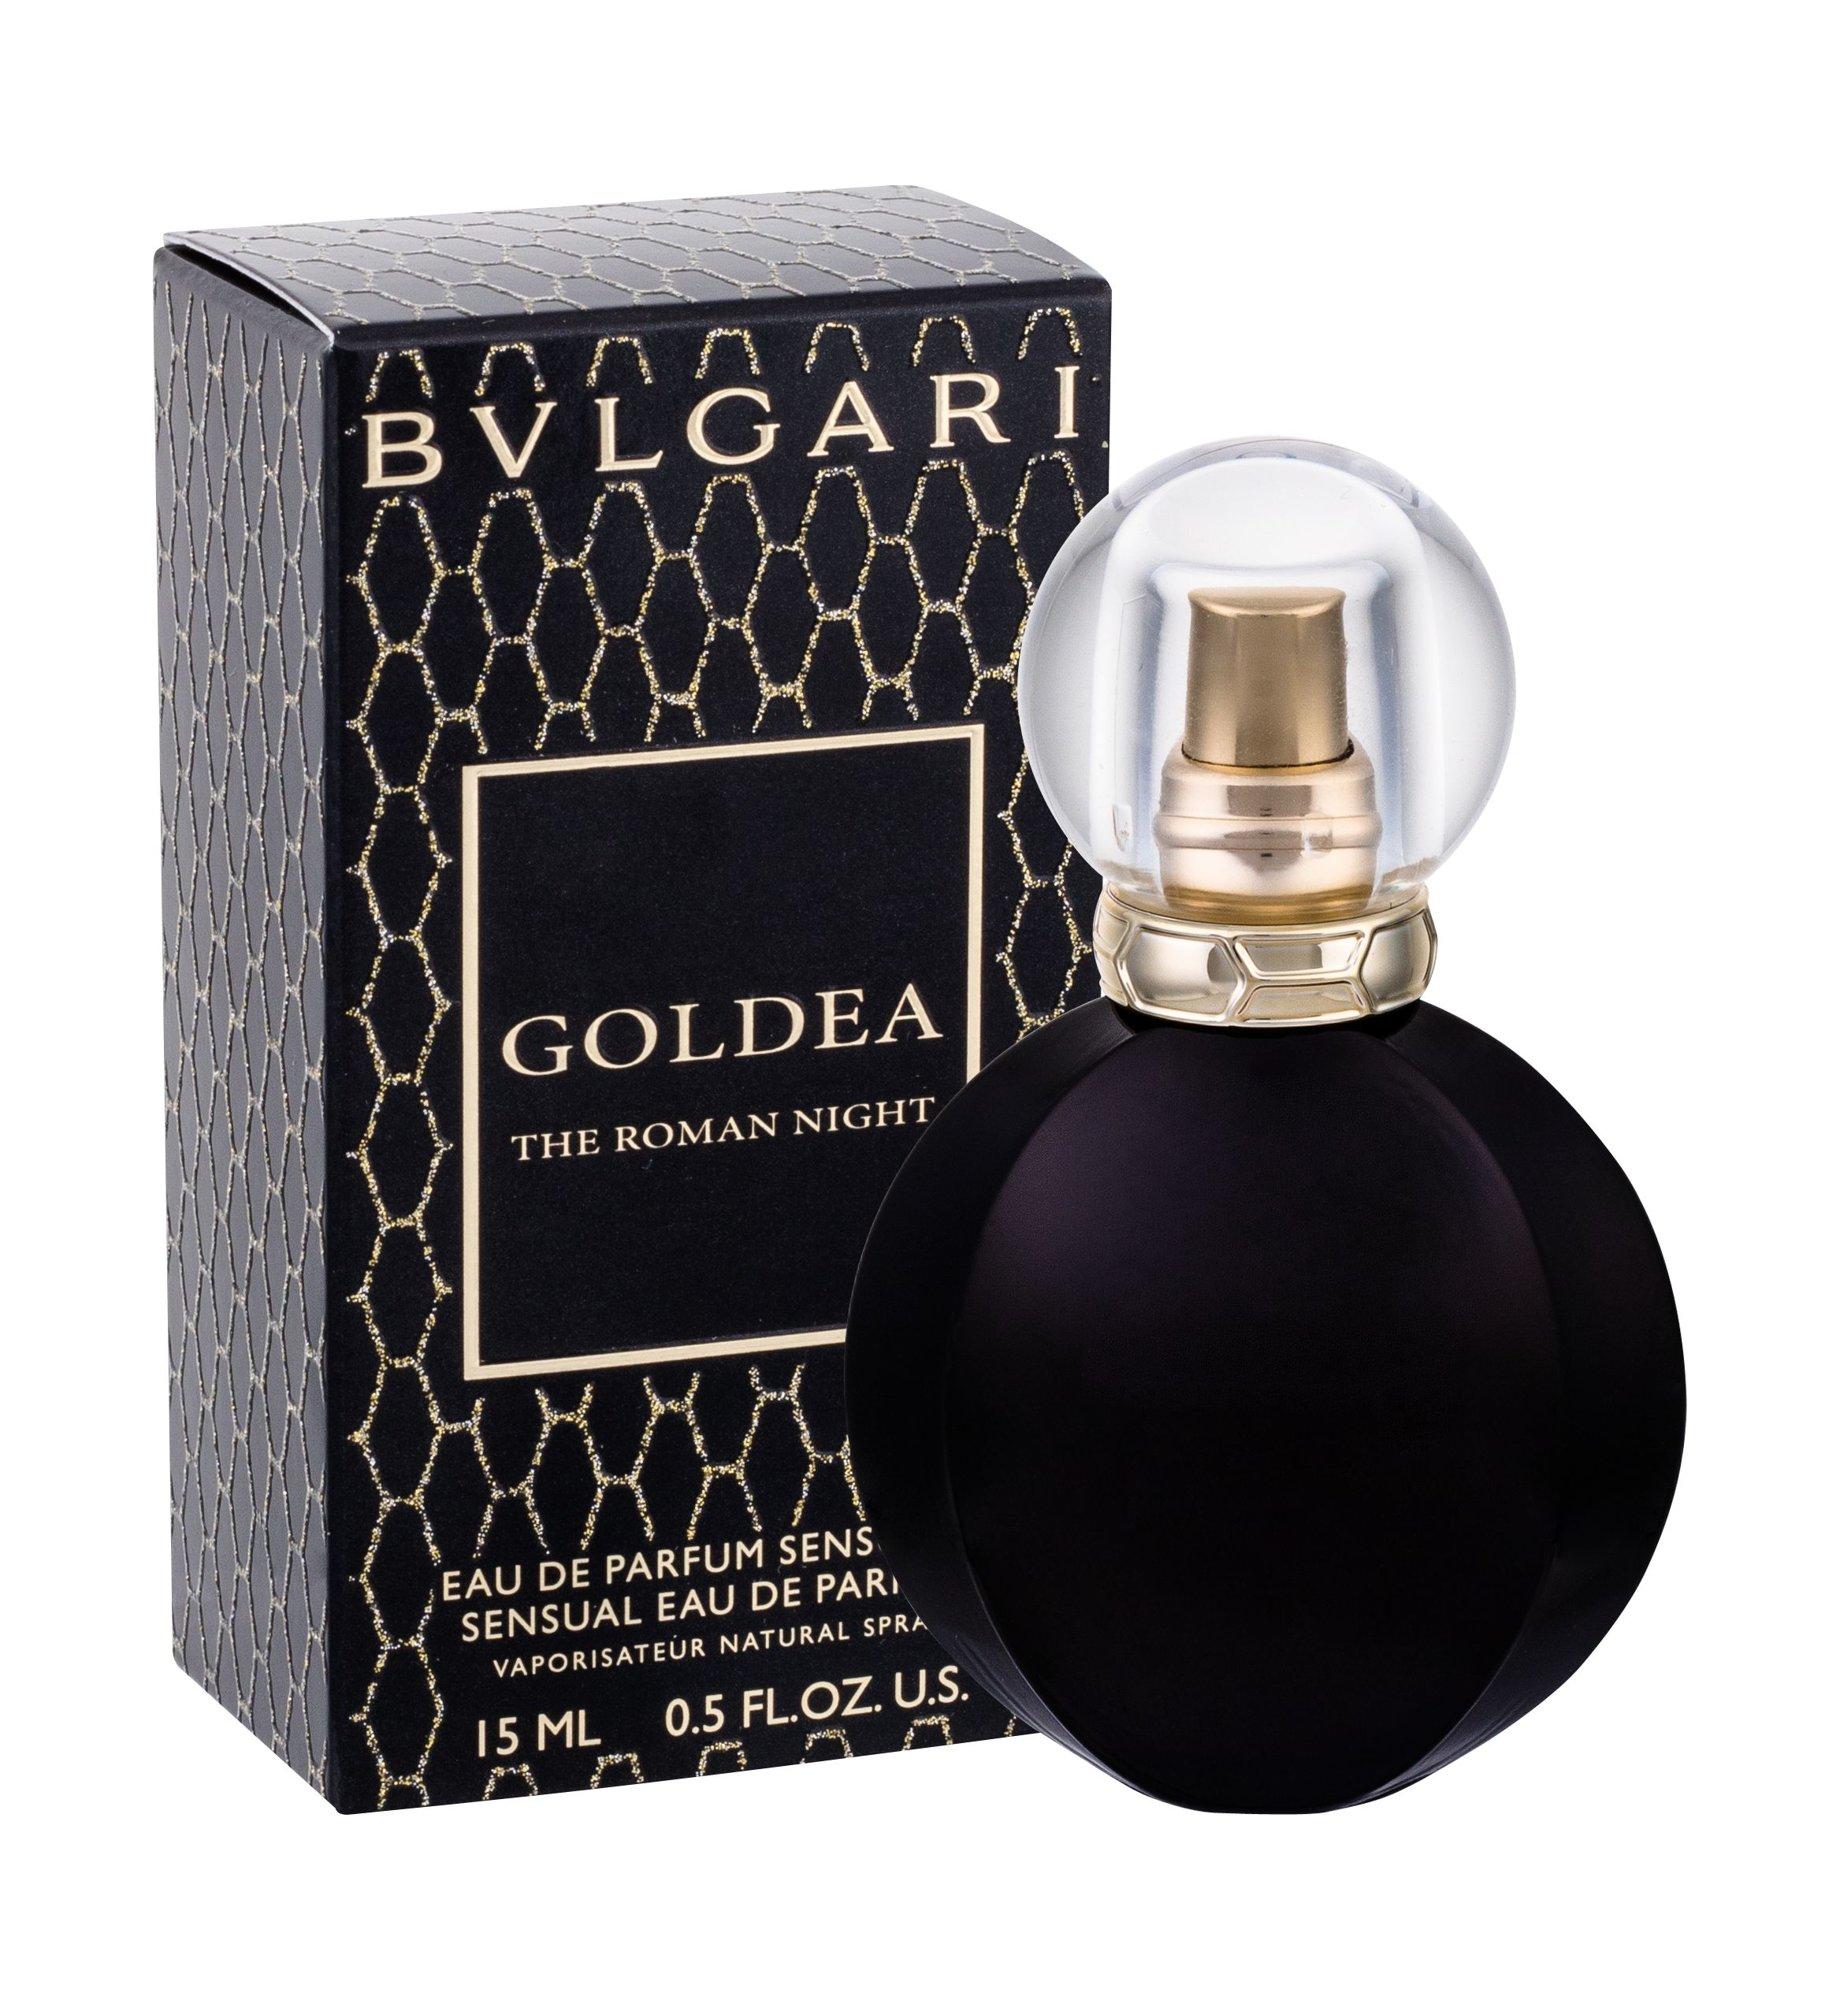 Bvlgari Goldea The Roman Night EDP 15ml